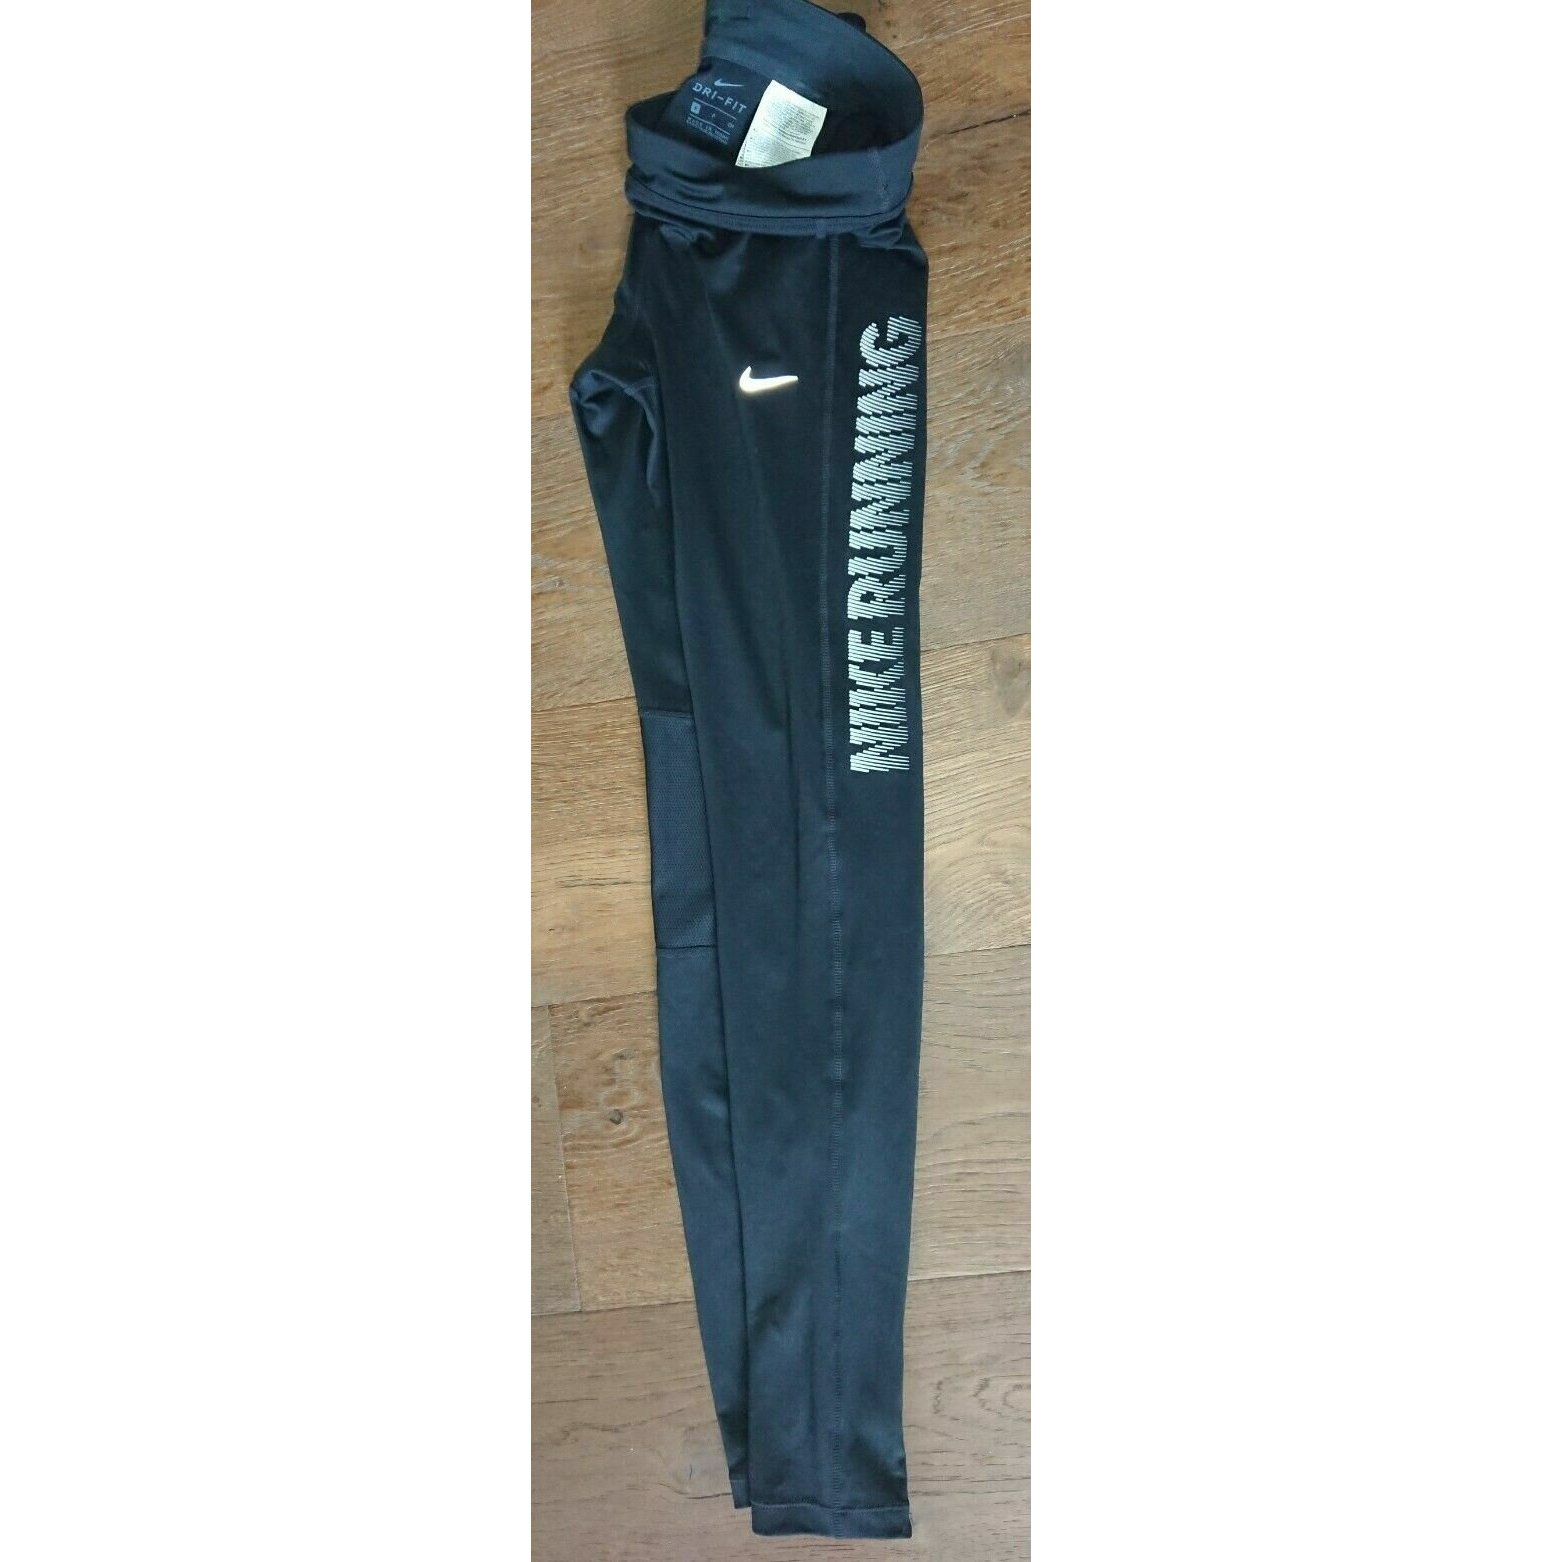 Nike Dri-Fit Leggings Gr. S Hose Running Stretch schwarz